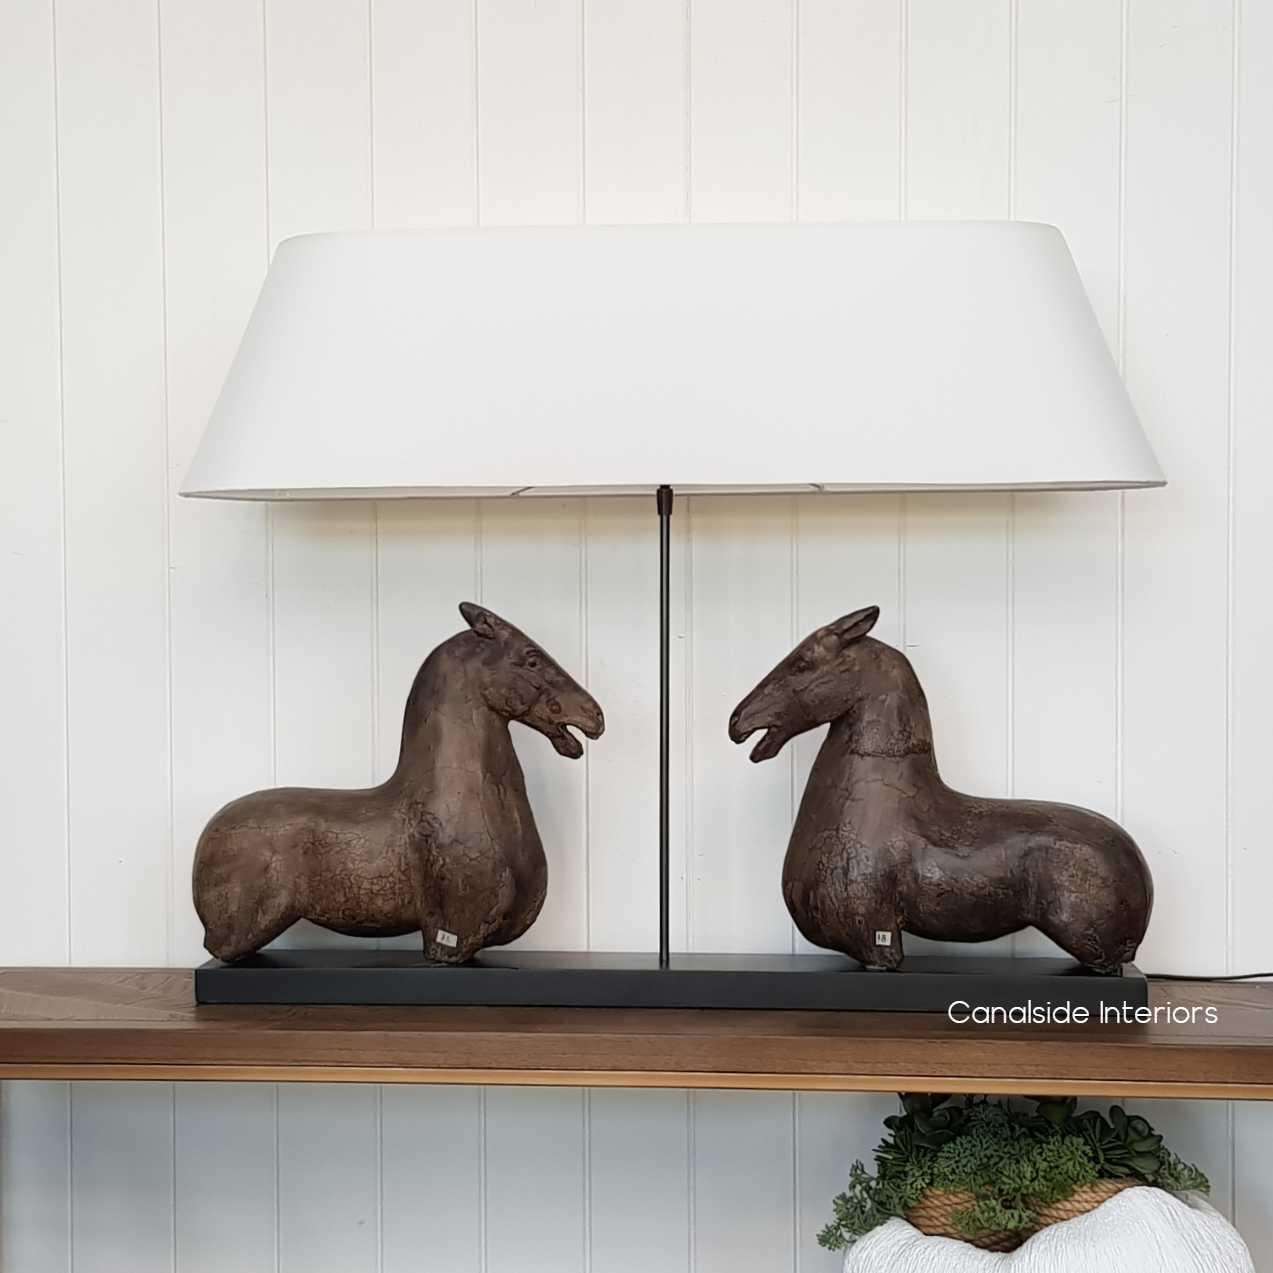 Ancient Equestrian Lamp - Canalside Interiors - Lamp - Horse - Horses - Lamps - hamptons - plantation - Light - Lighting Lights